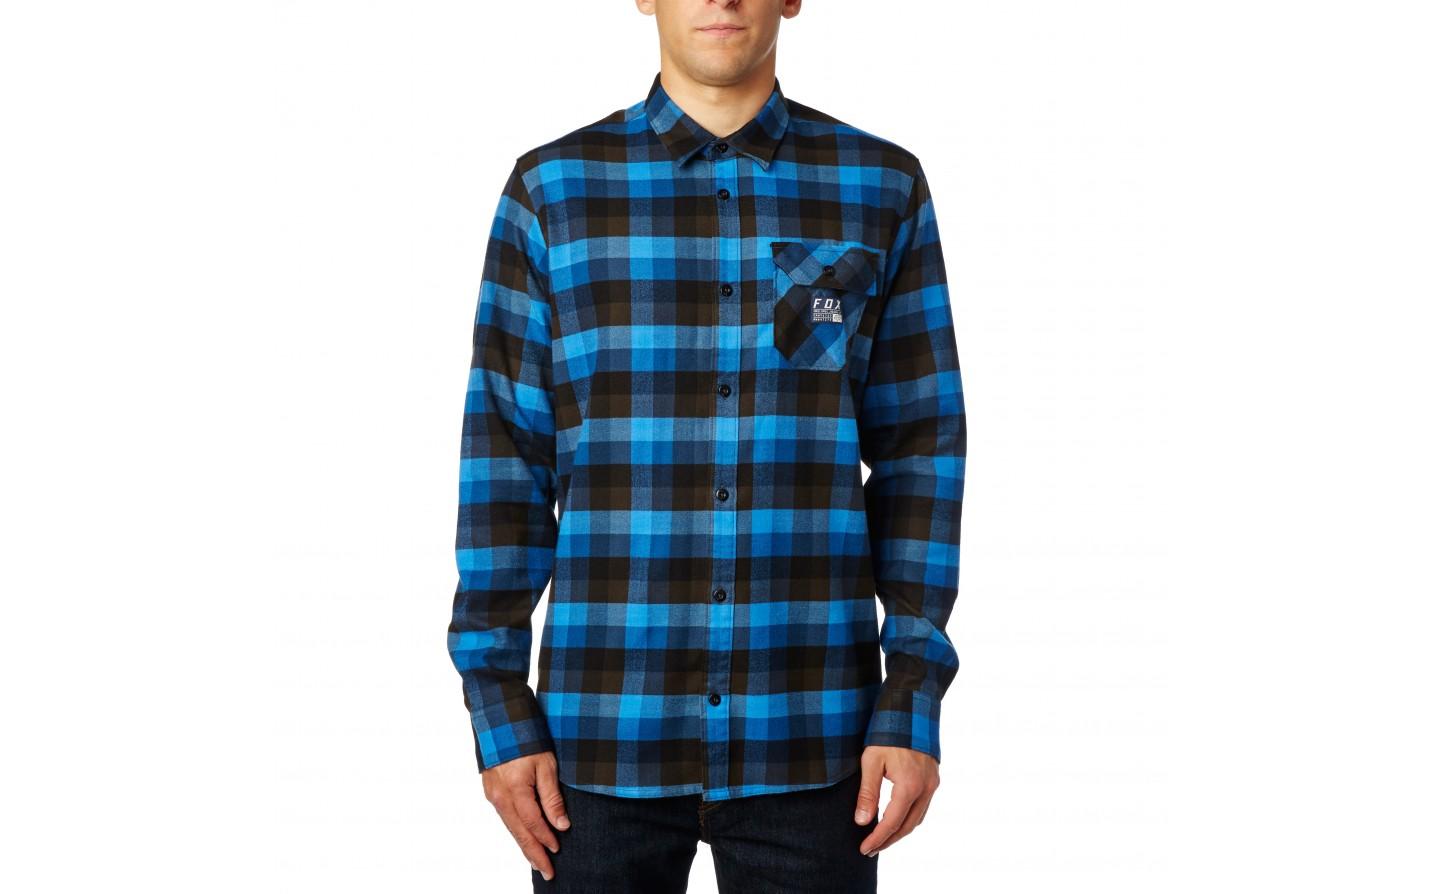 9c9909346 ... Camisa Manga Larga Fox Rovar Flannel Azul